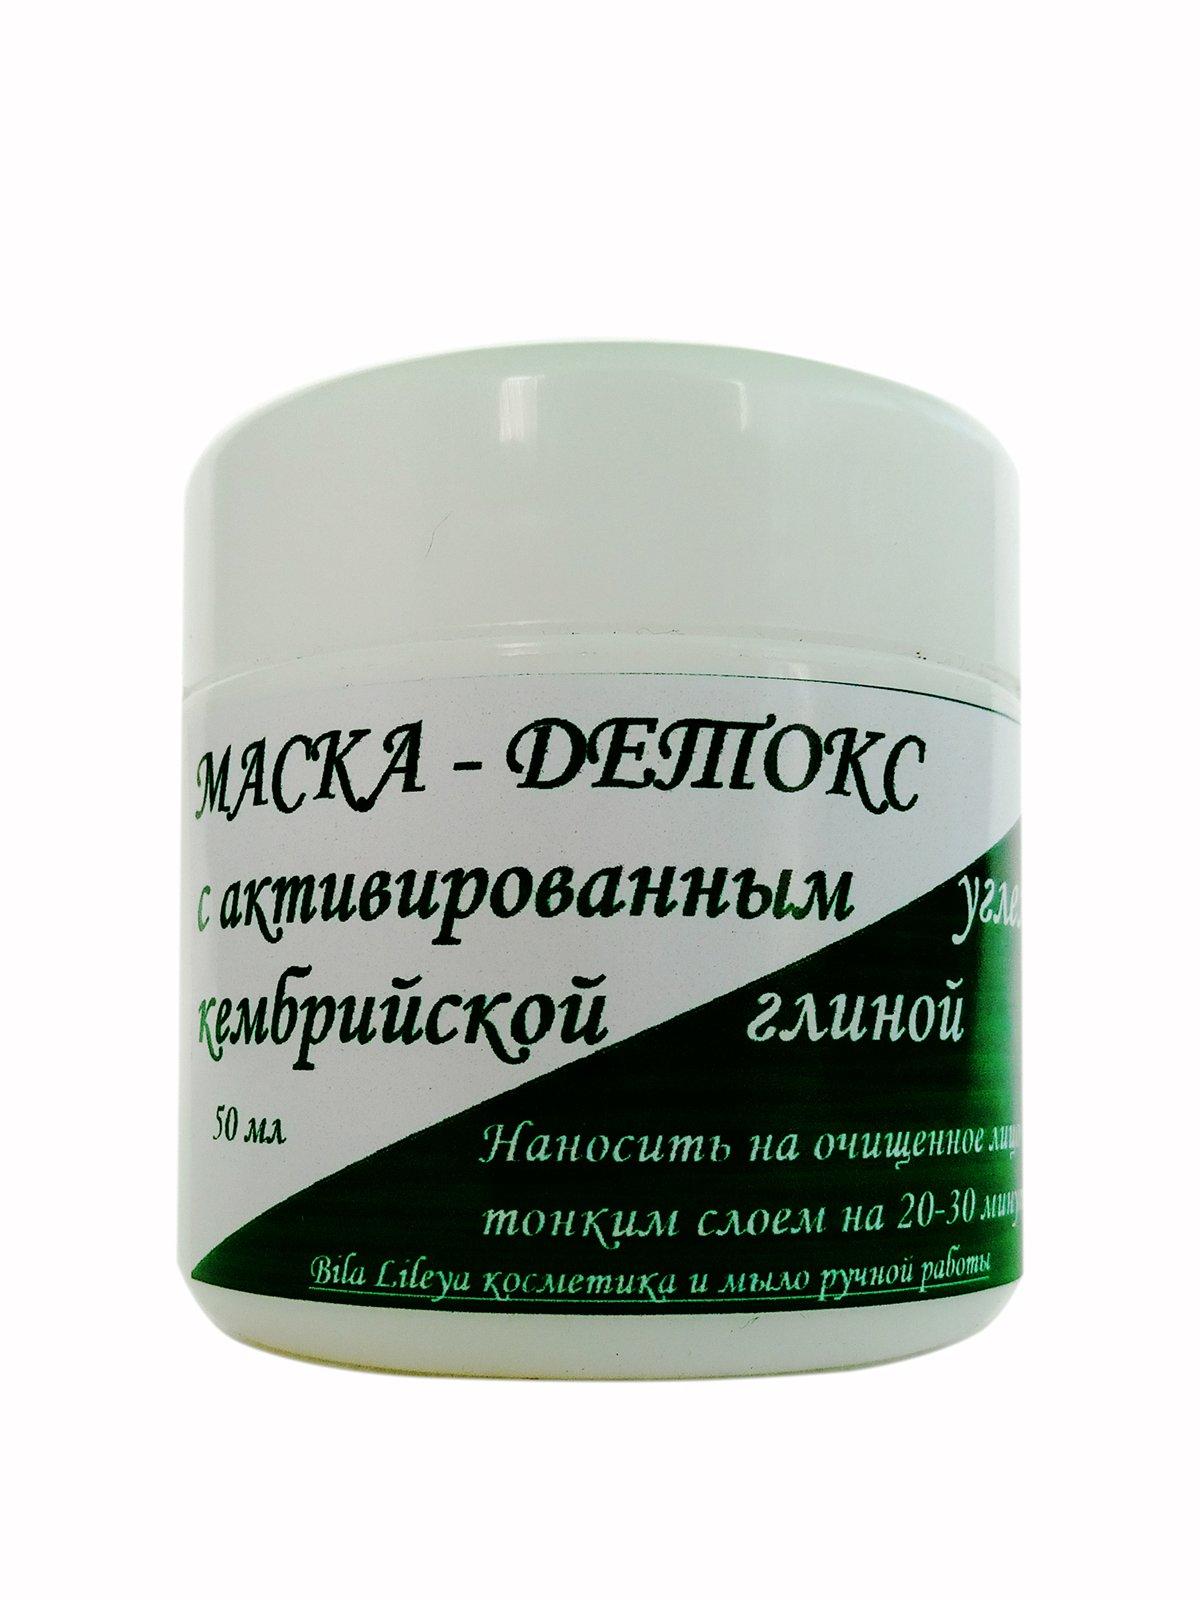 Маски для лиця з натурально глини